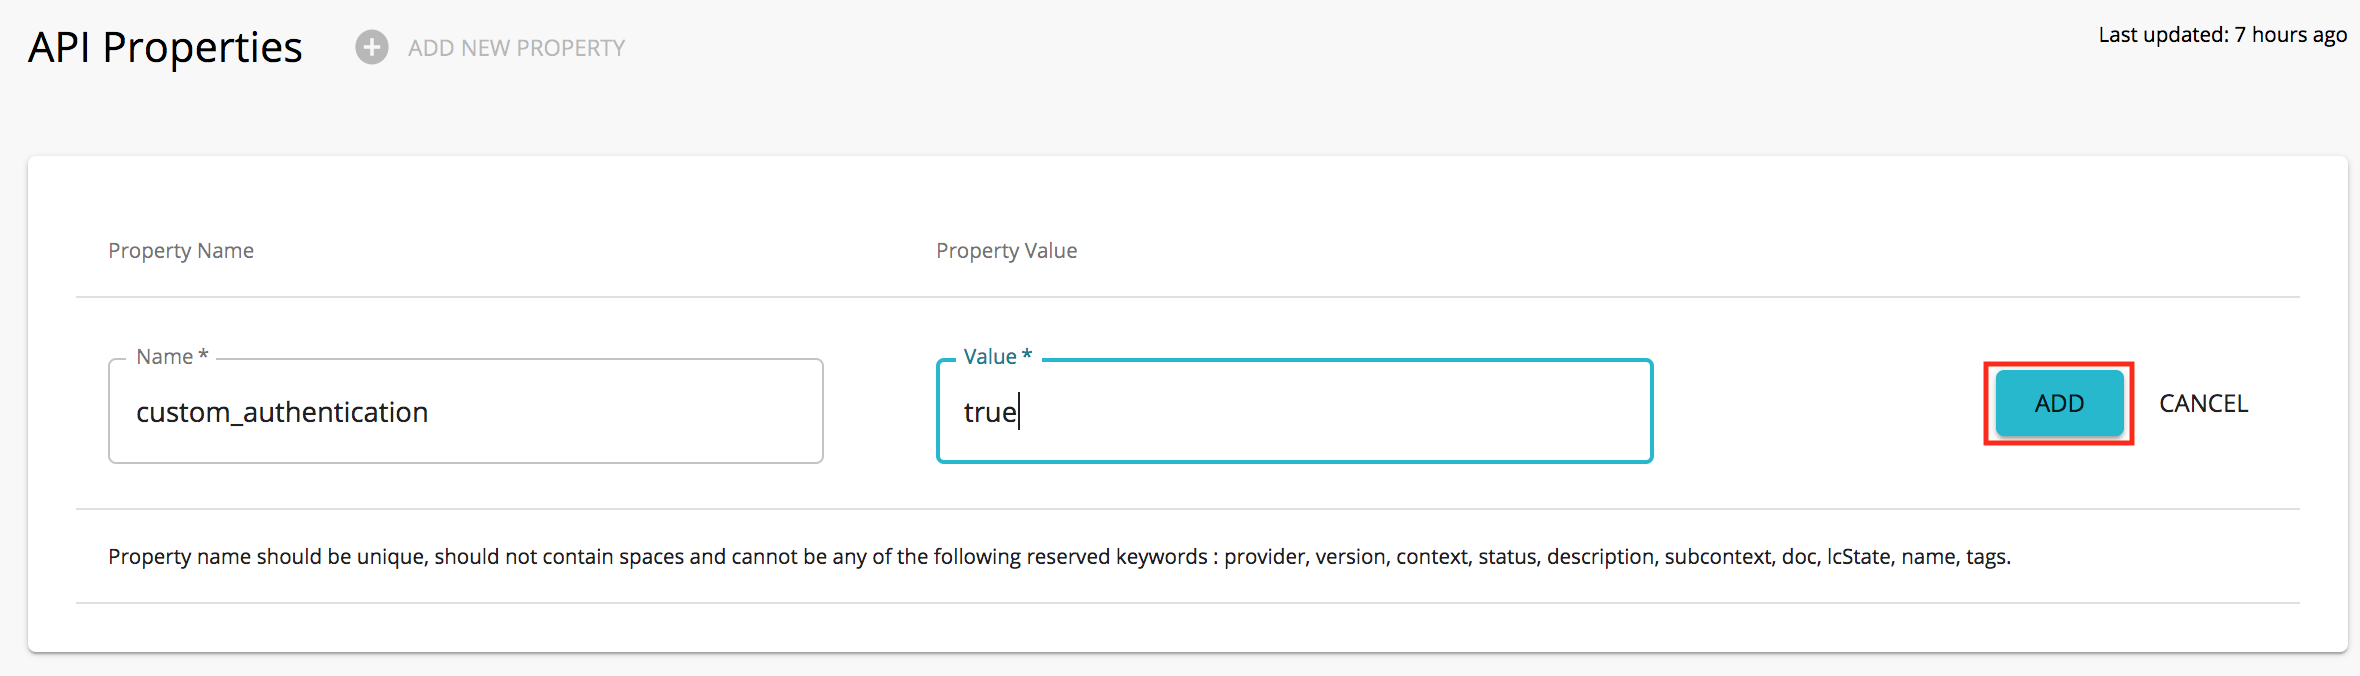 Add Custom Property